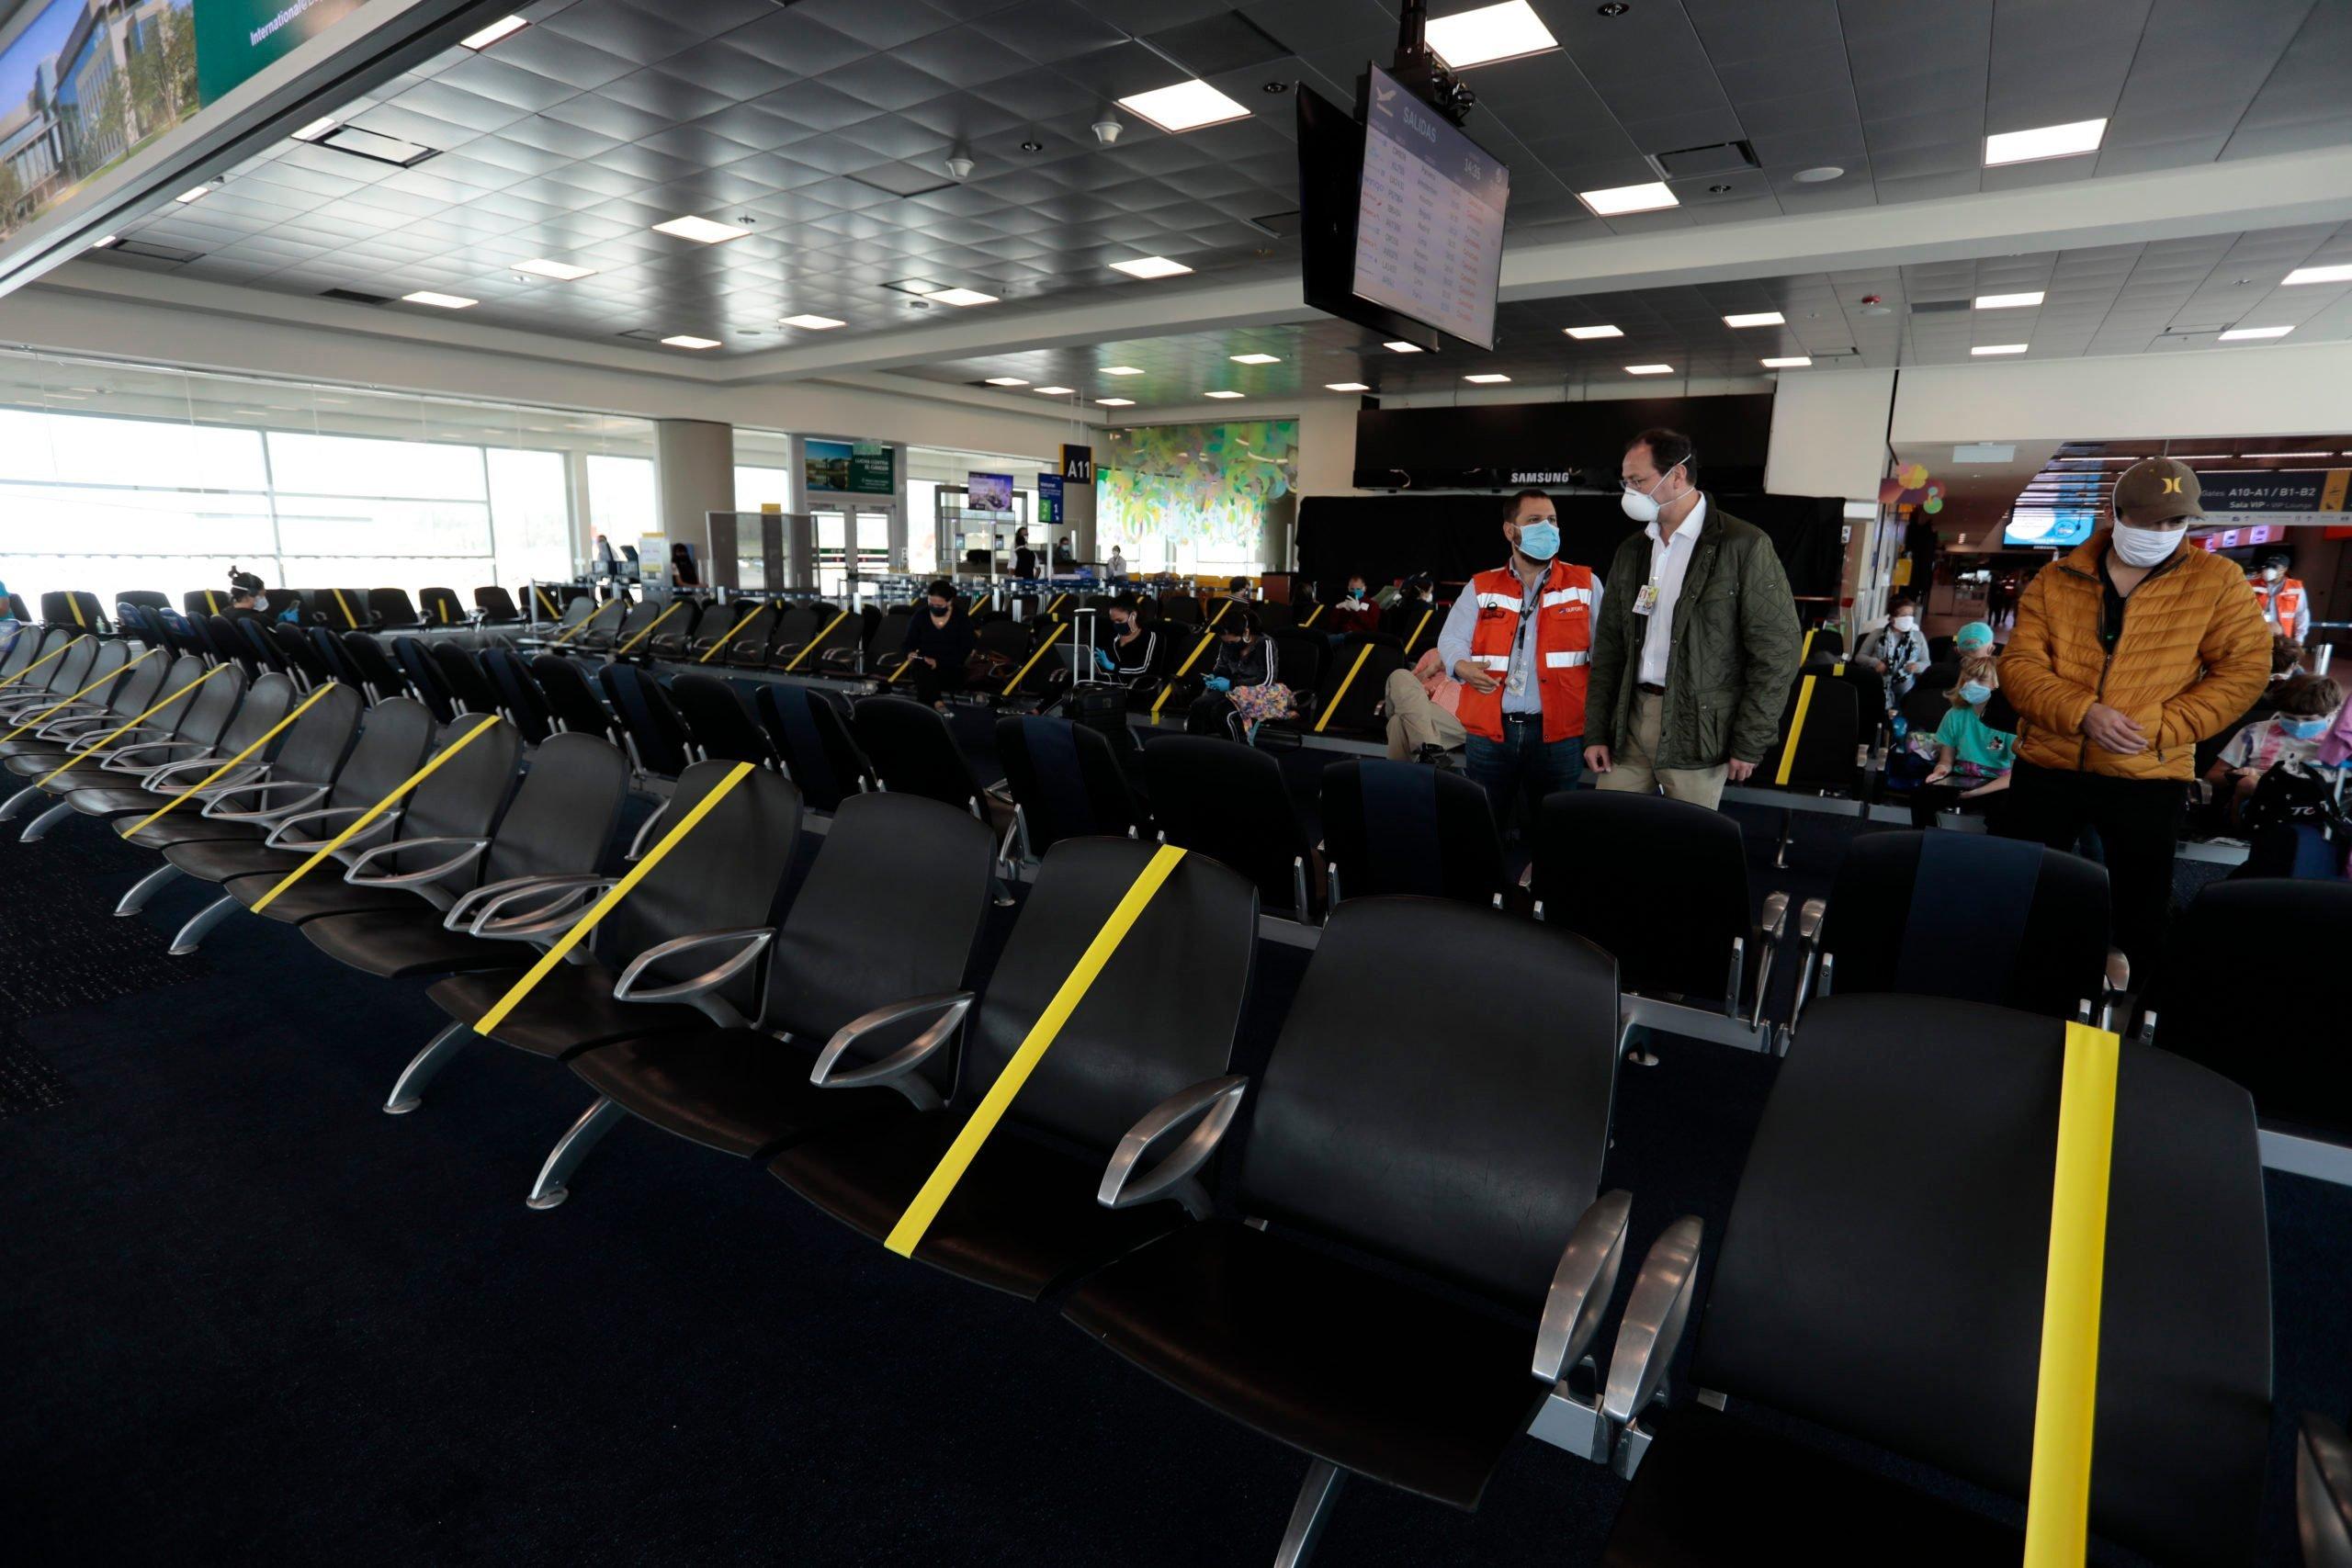 Ecuador Prepares To Reopen Airports During Coronavirus Pandemic